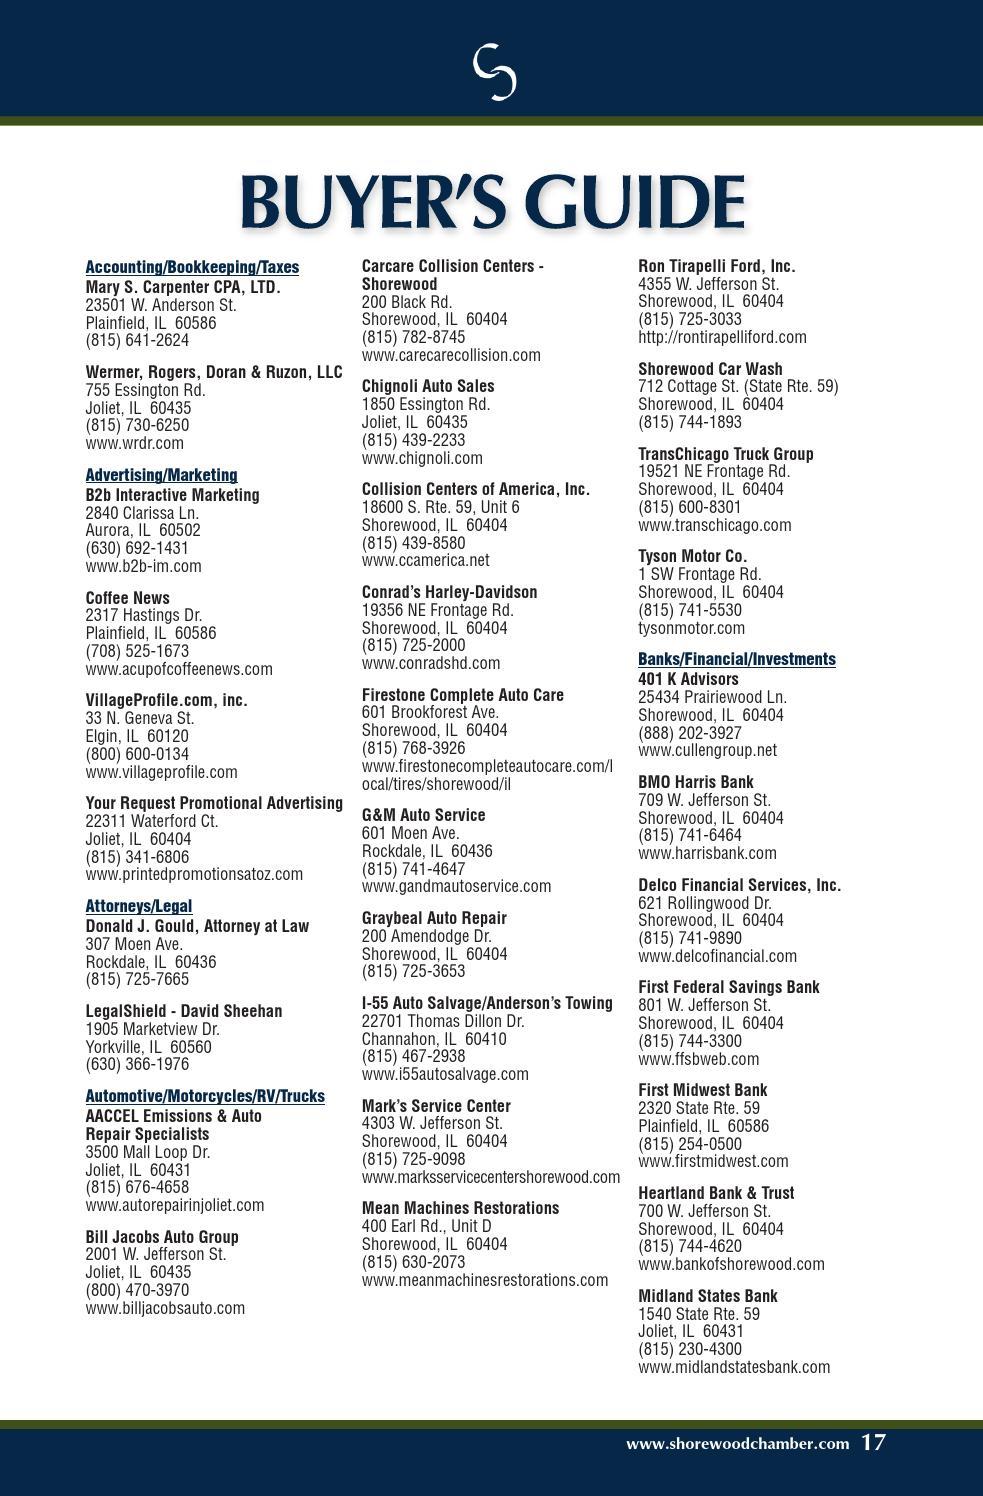 Conrads Harley Davidson >> Shorewood IL Community Profile by Townsquare Publications ...